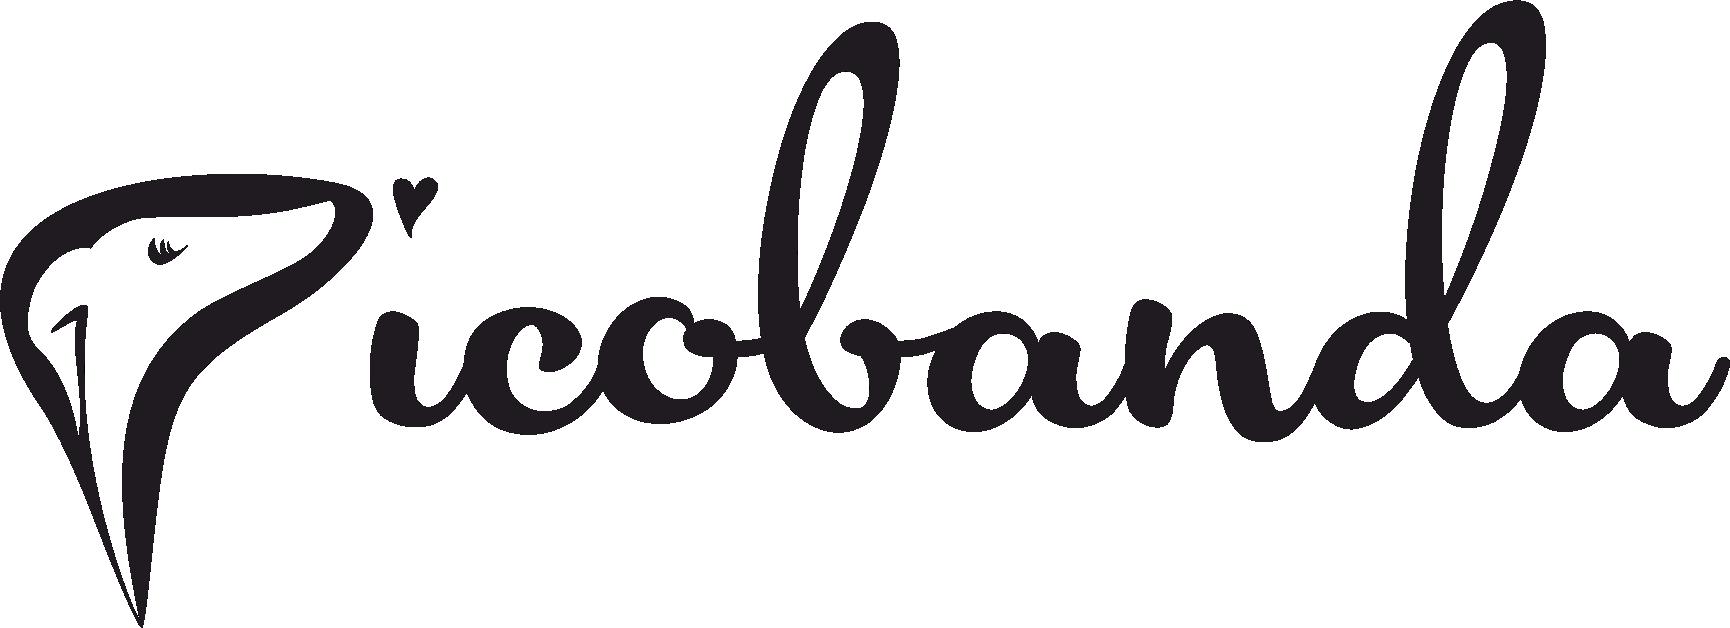 Picobanda